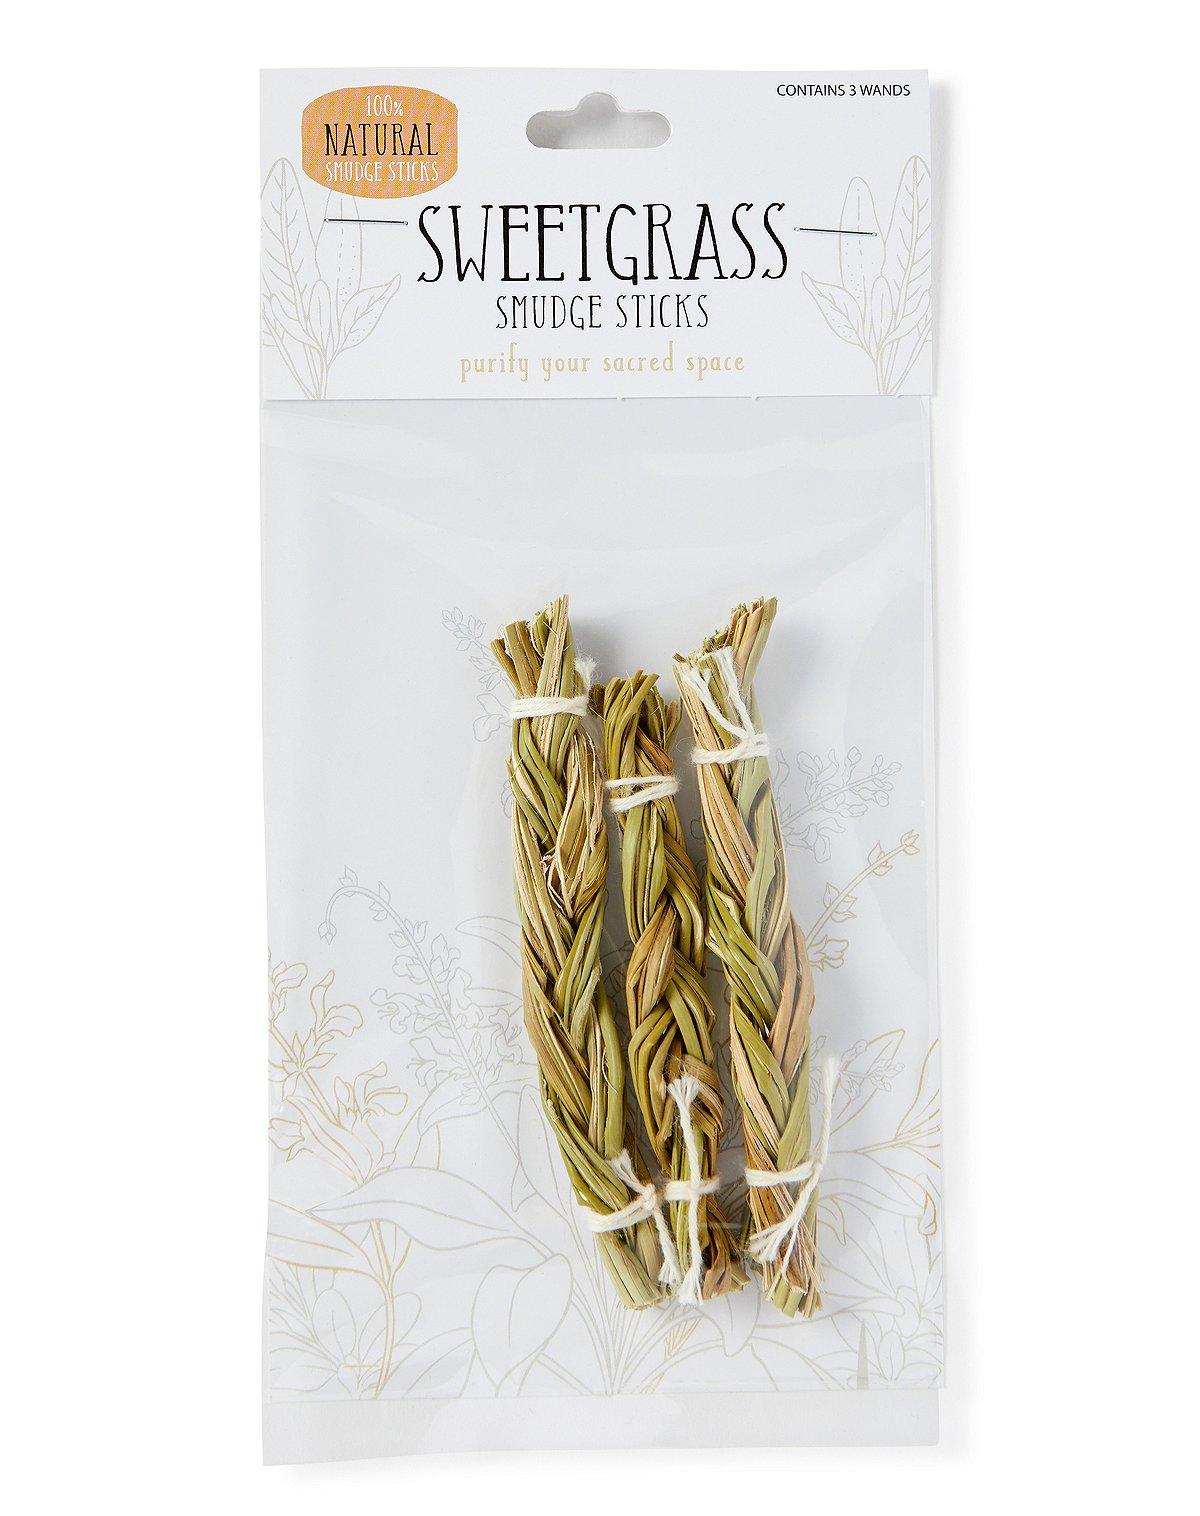 Sweetgrass Smudge Sticks - 3 Pack